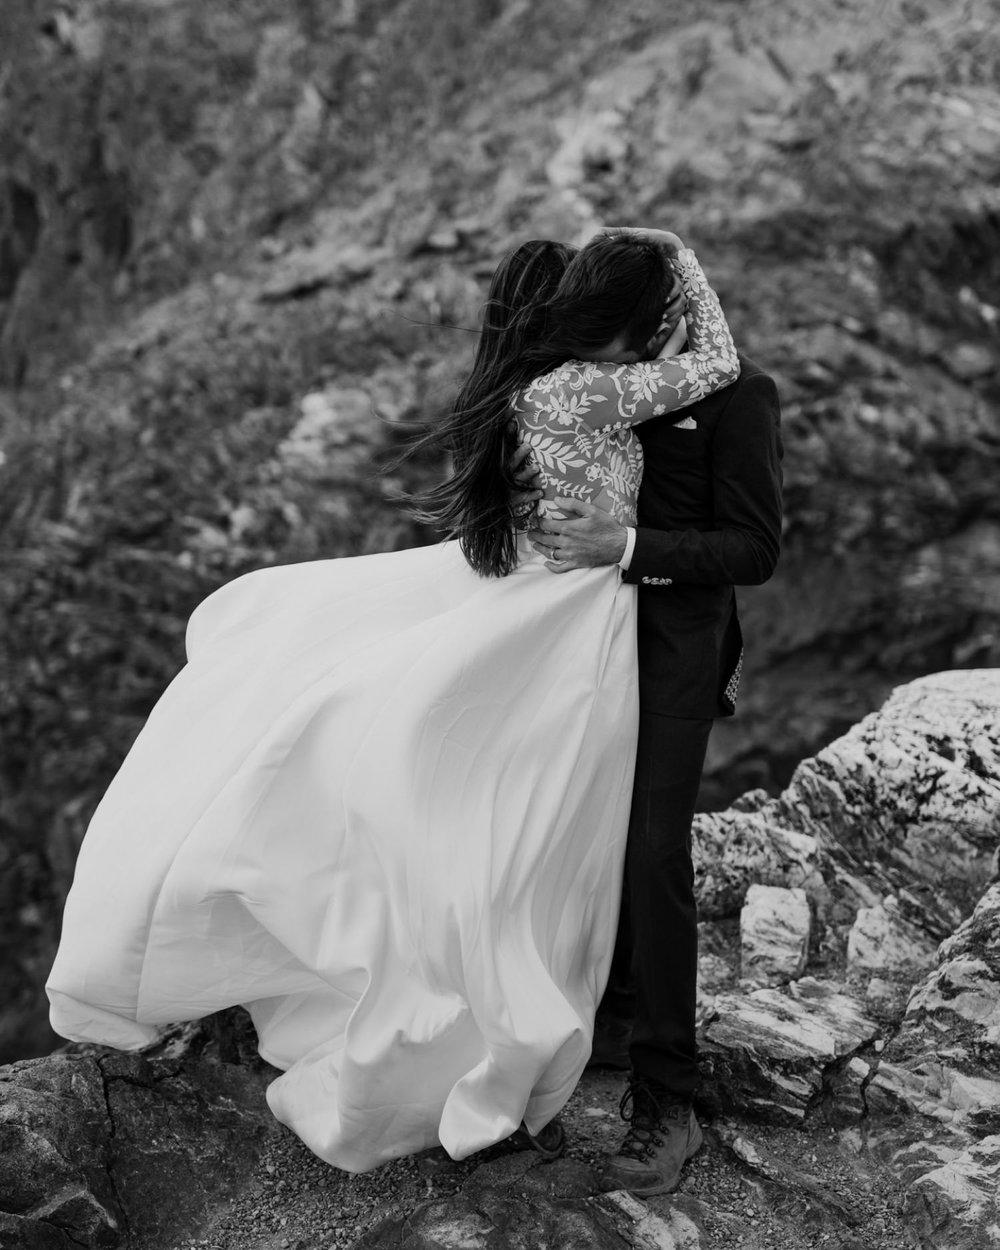 patagonia-argentina-adventure-wedding-session-51.jpg